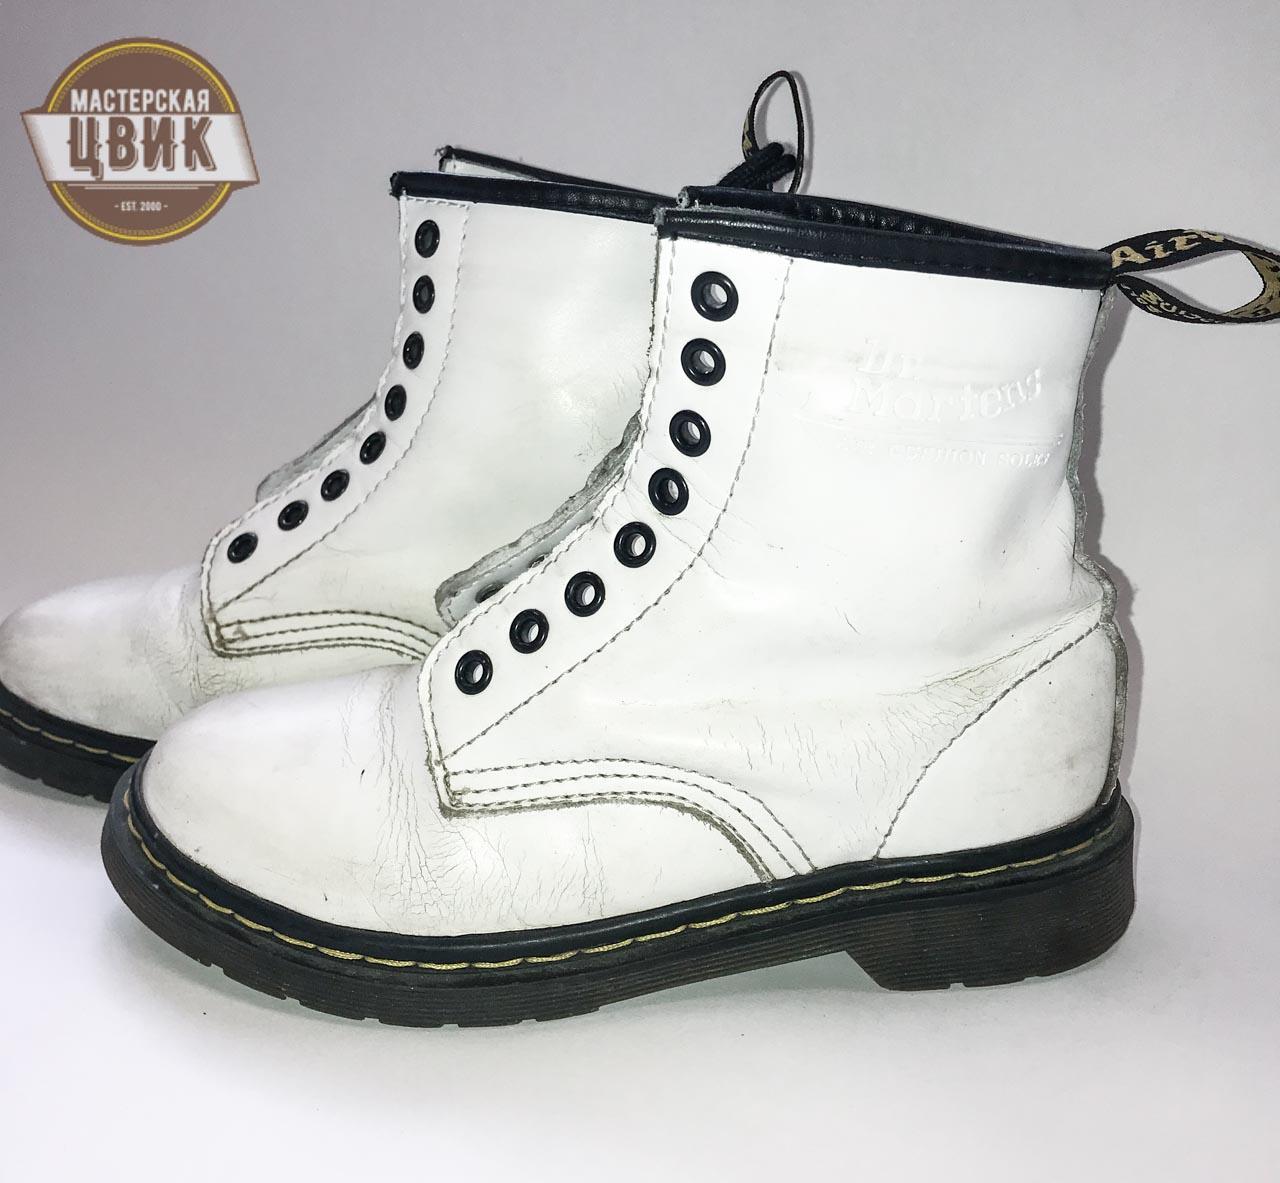 individualnyj-poshiv-obuvi-minsk-27 Индивидуальный пошив обуви